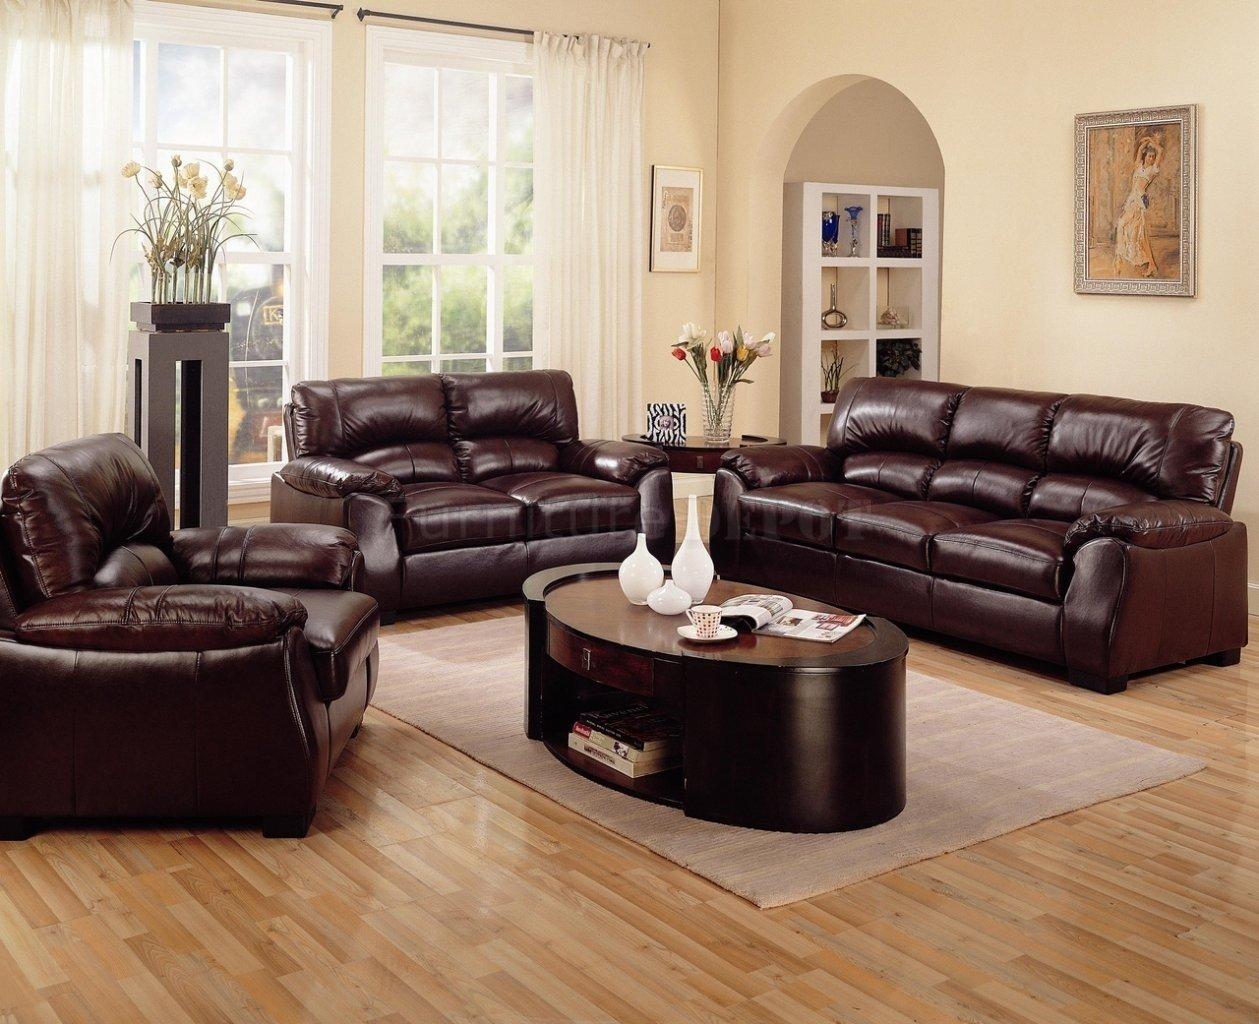 10 Lovable Leather Sofa Living Room Ideas living room ideas with leather furniture e280a2 living room furniture 2021